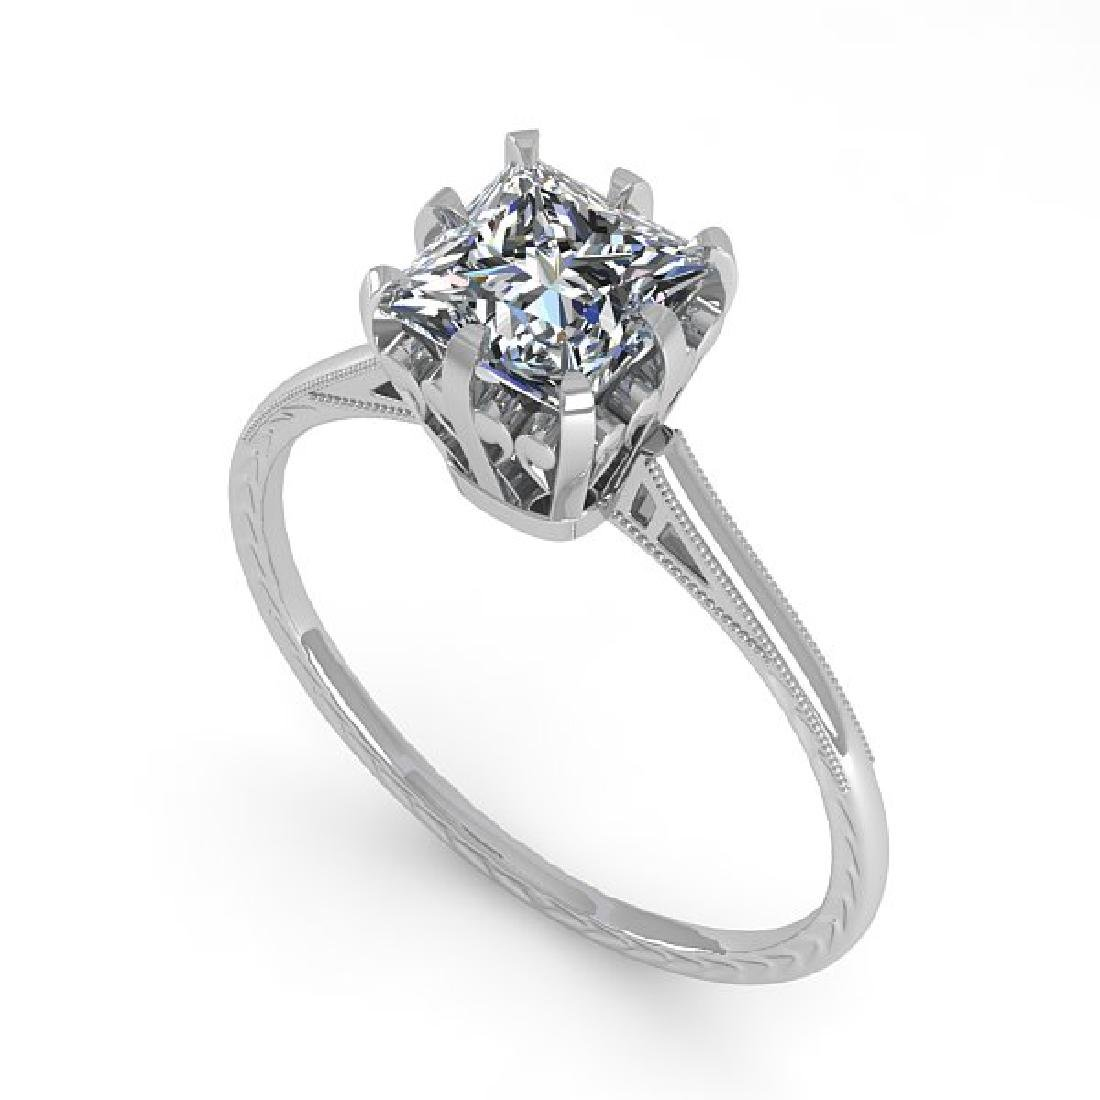 1.0 CTW VS/SI Princess Diamond Solitaire Ring 14K White - 2